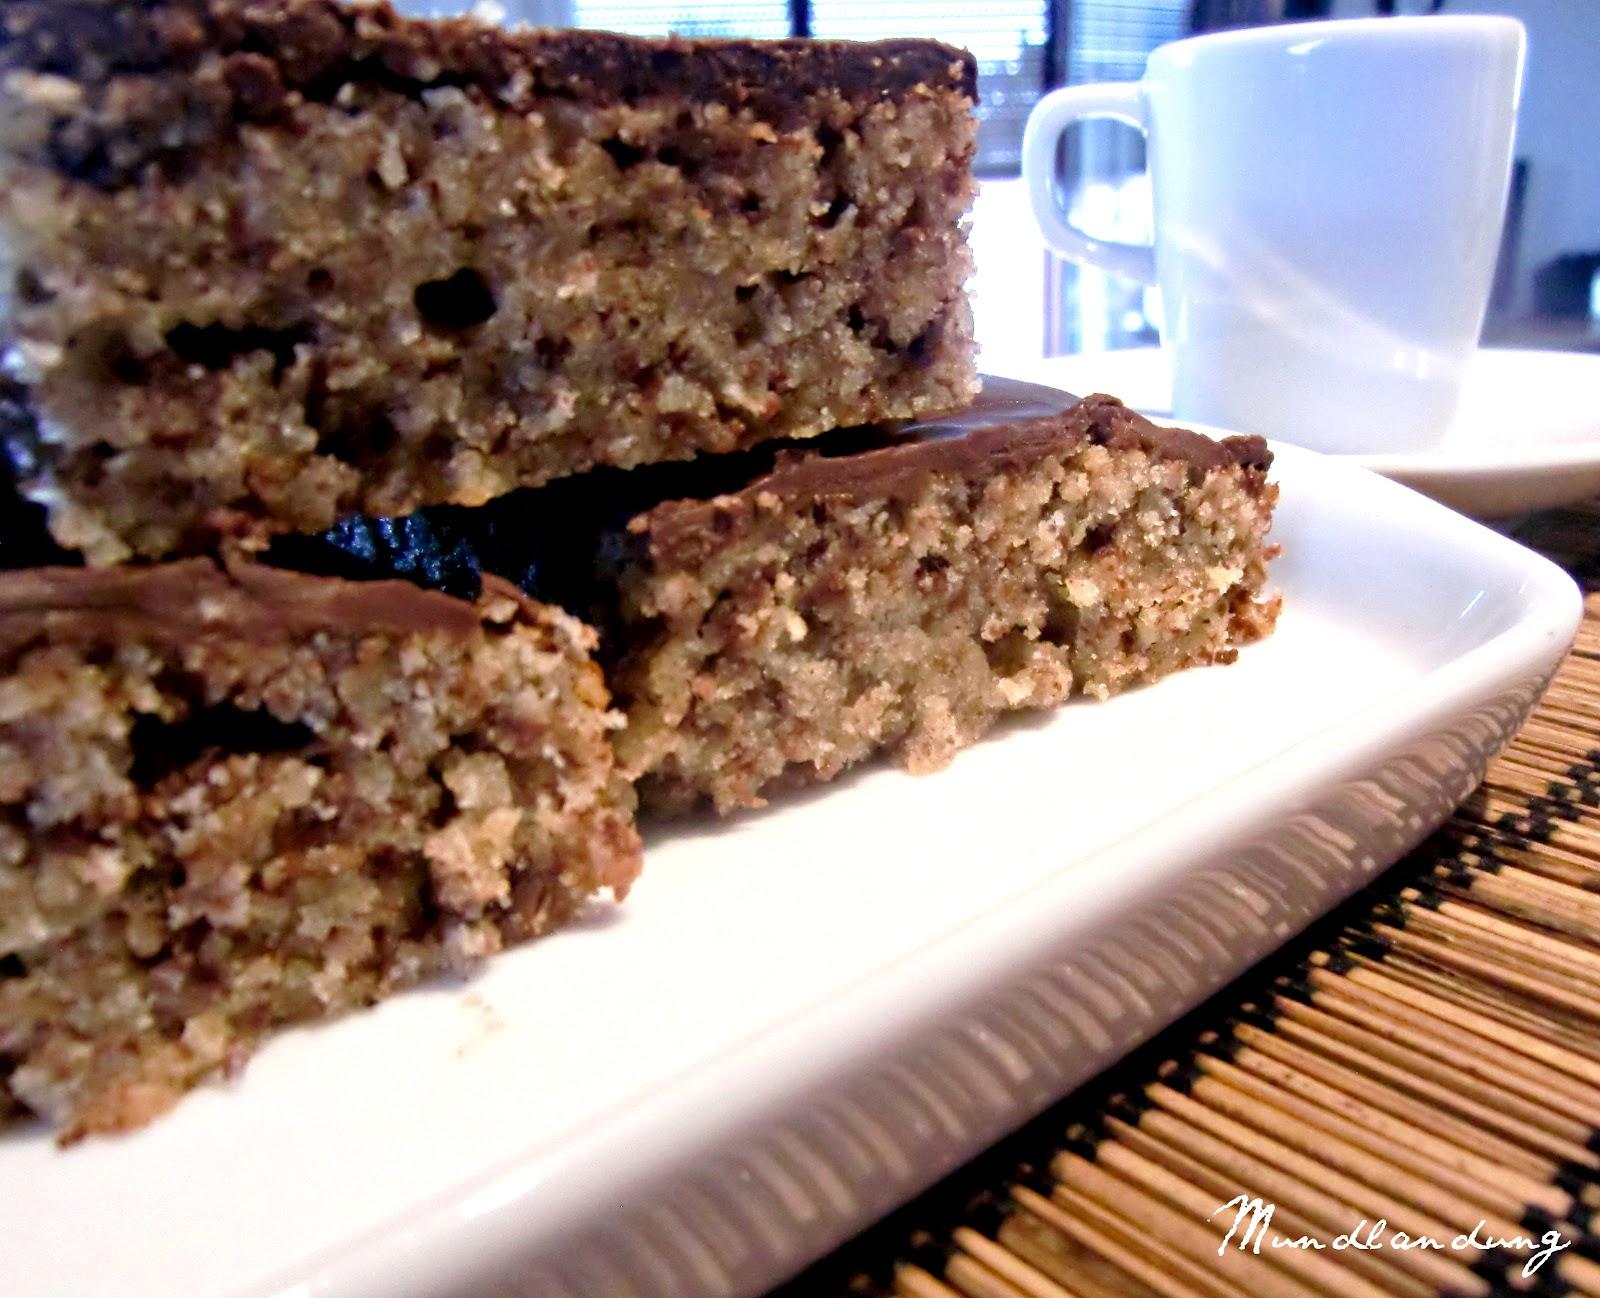 Saftiger Schoko Walnuss Kuchen Rezept Kochrezepte At